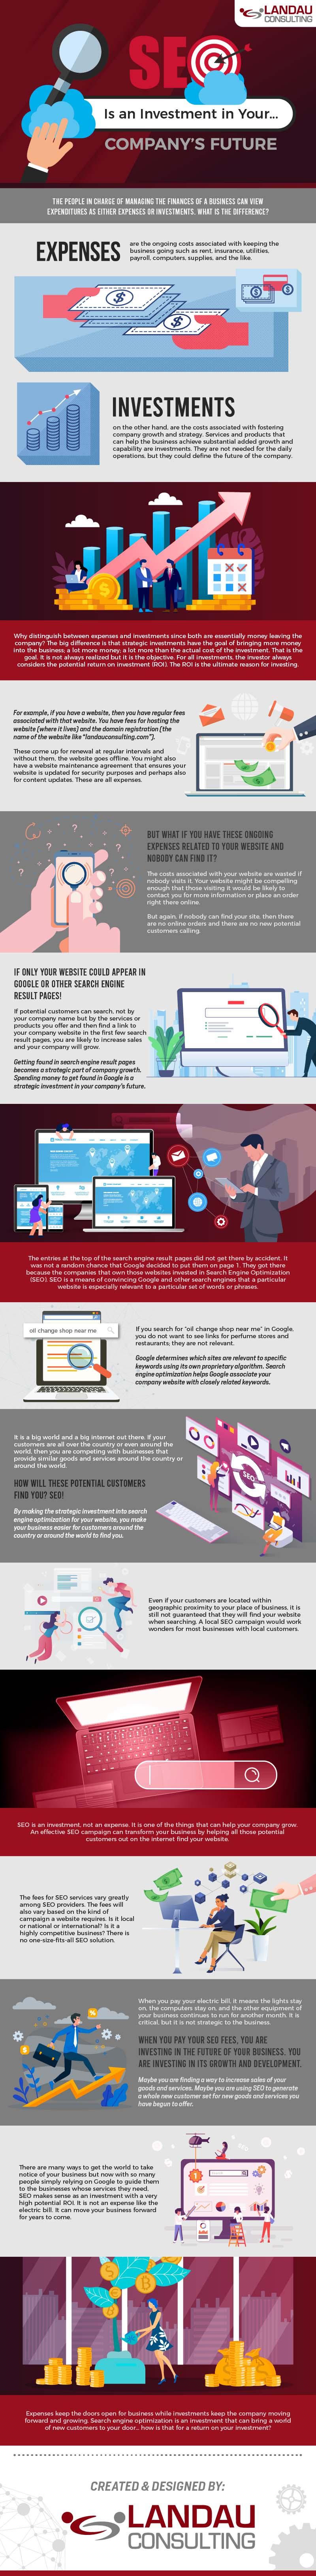 Search Engine Optimization Investment in Companys Future